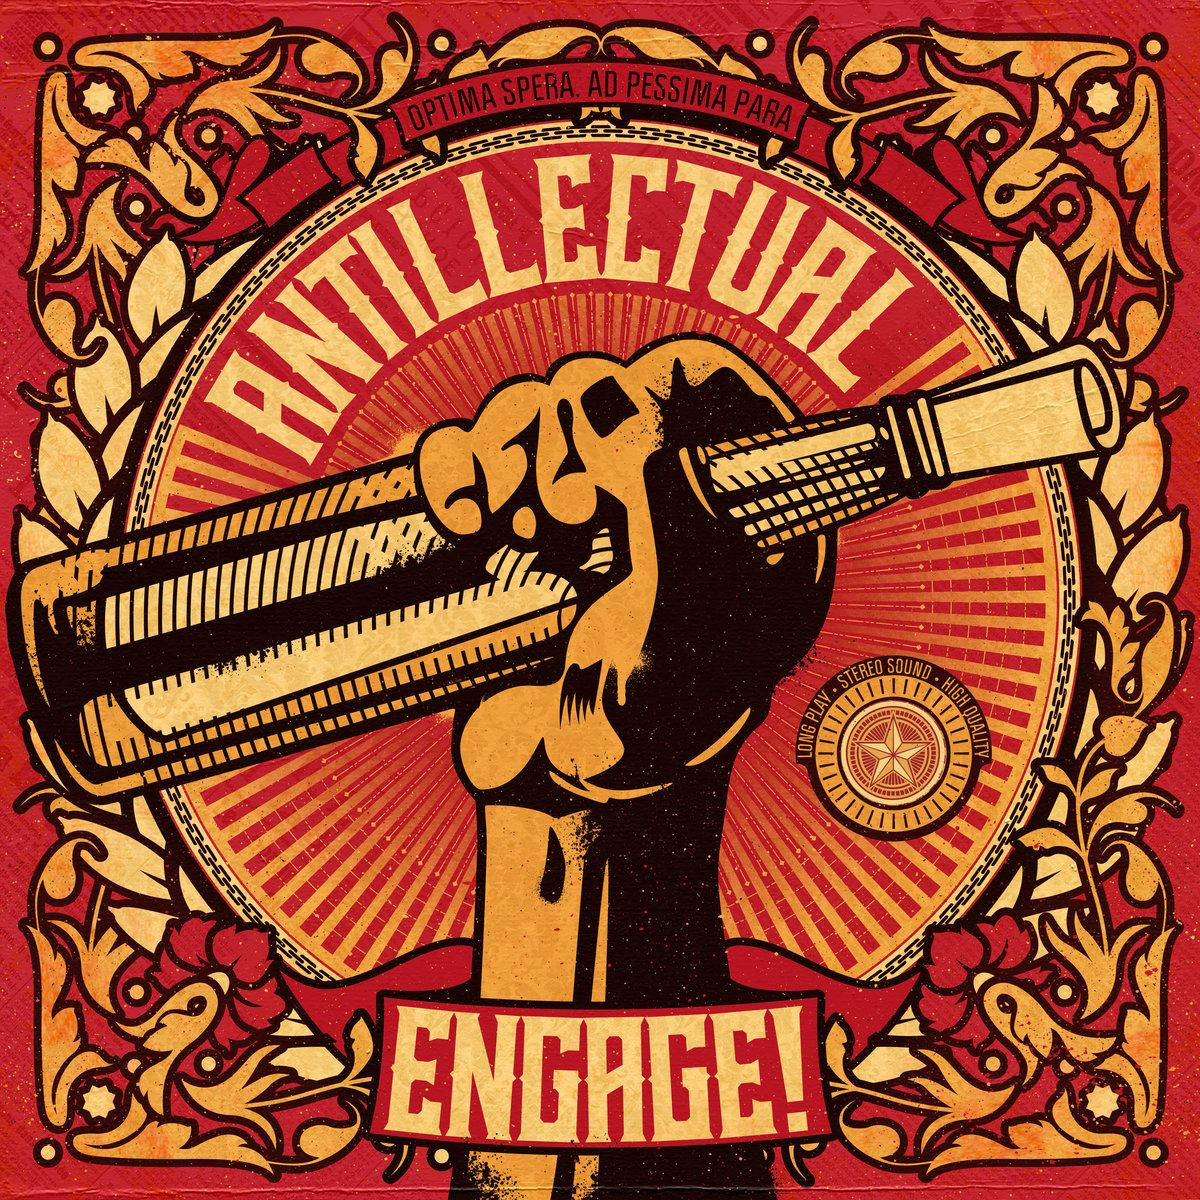 Antillectual - Engage! (2016)